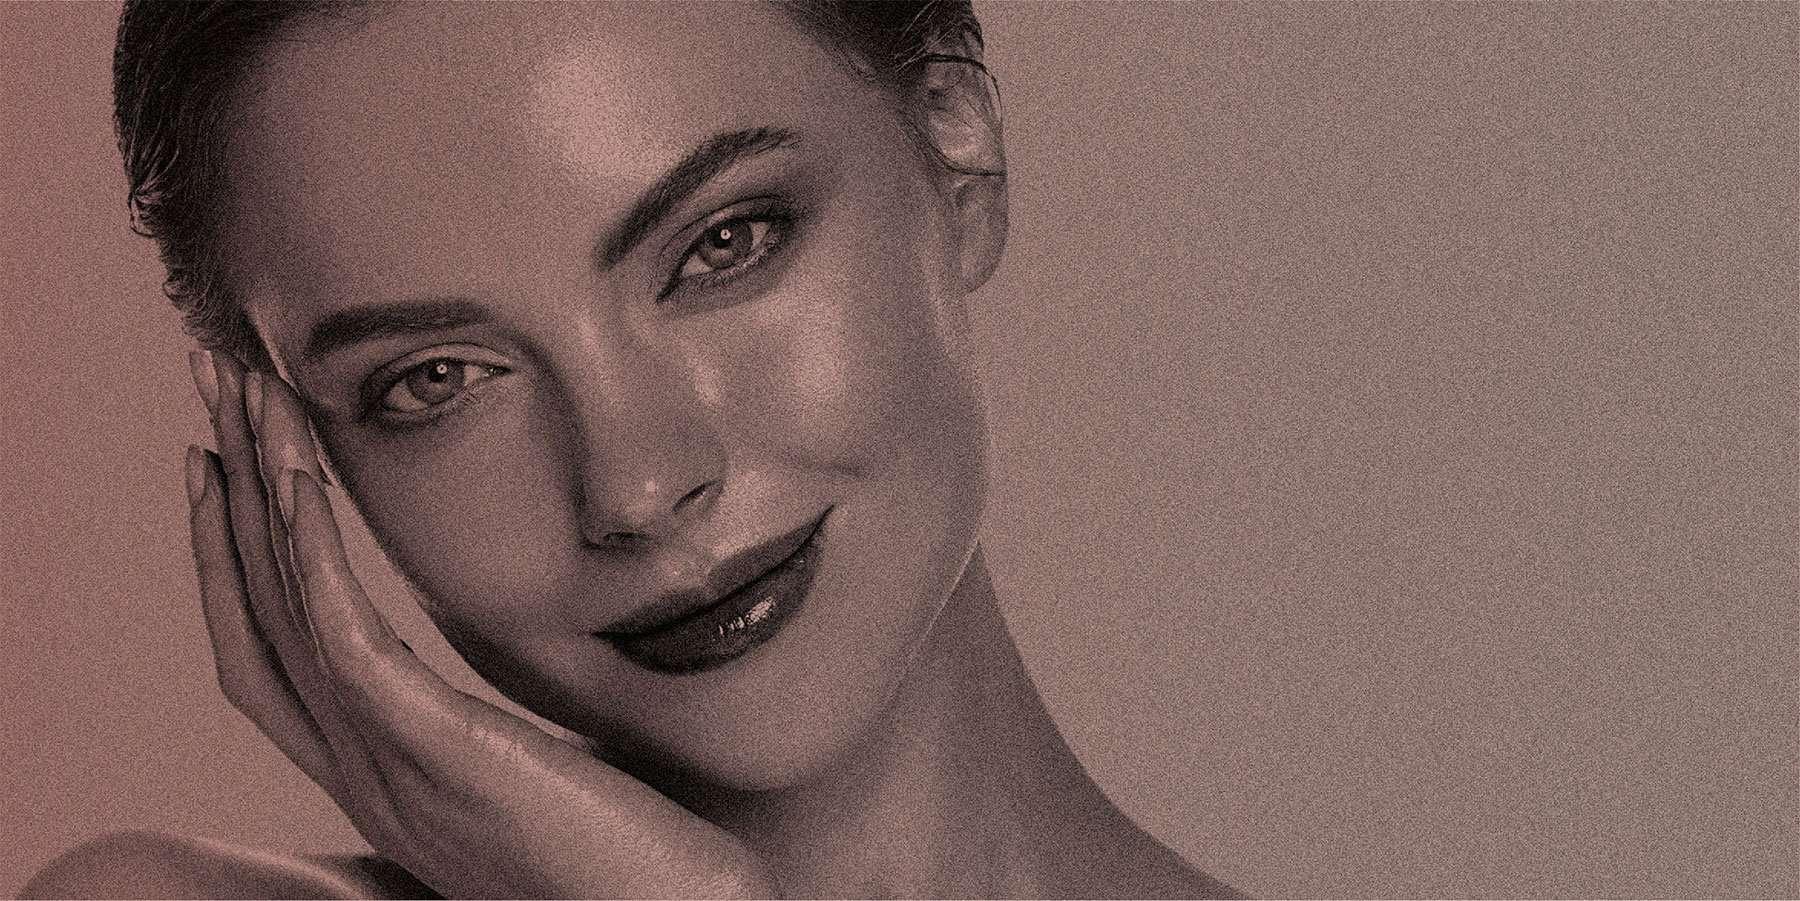 Aquajet Microdermabrasion Facial image